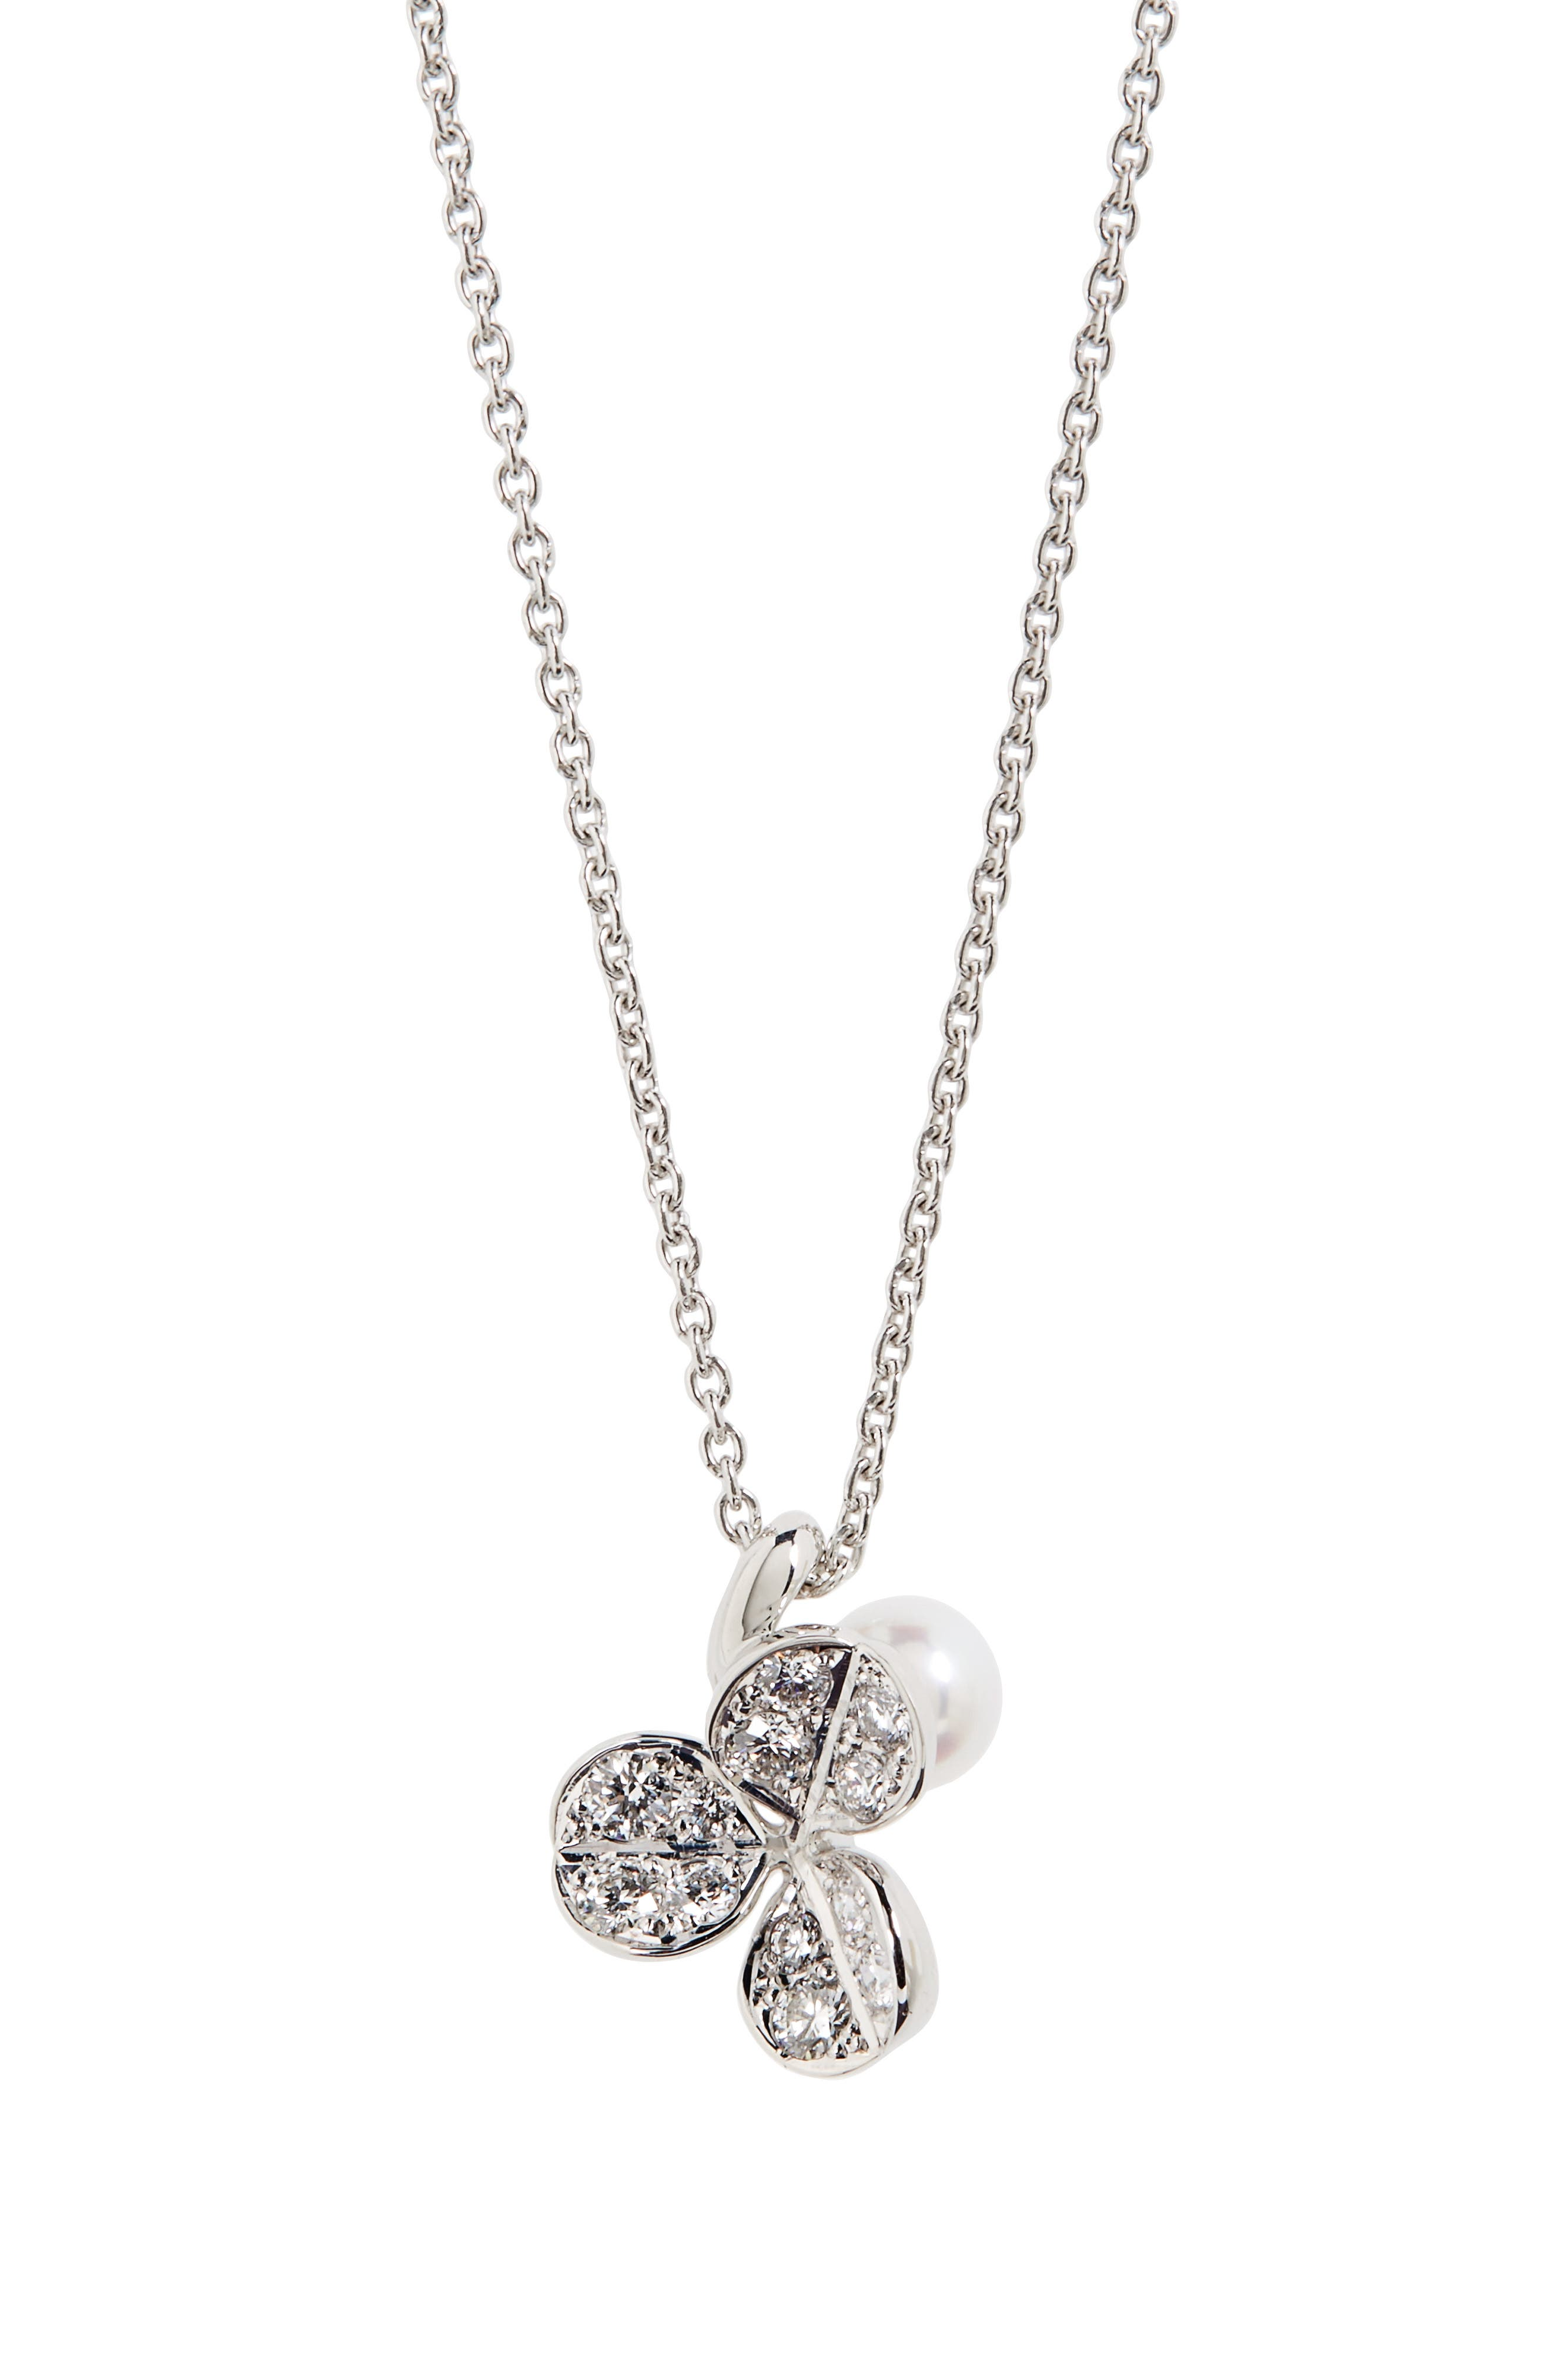 MIKIMOTO Fortune Leaves Pearl & Diamond Pendant Necklace